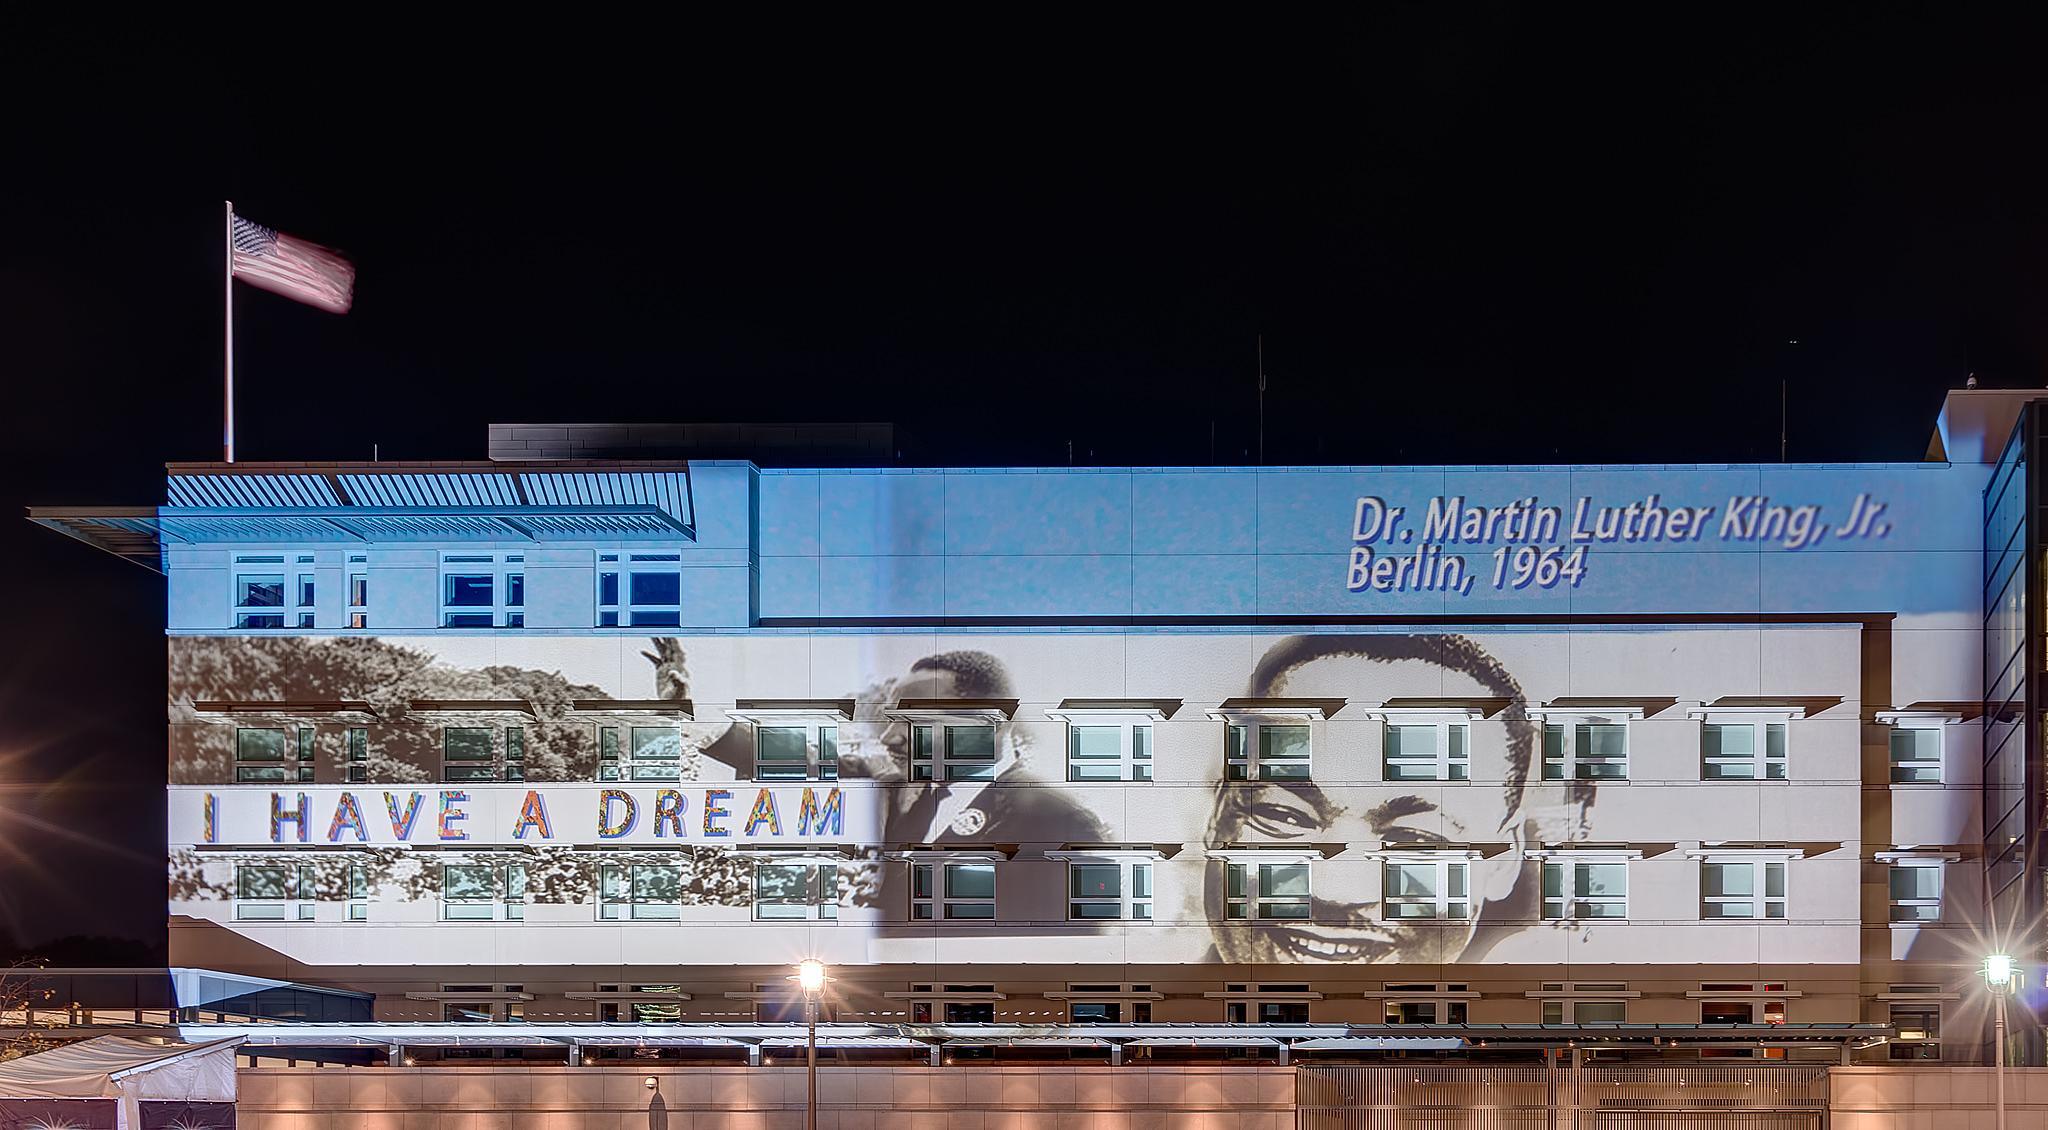 Botschaft der USA in Berlin - Fol 2014 by Frank Haase